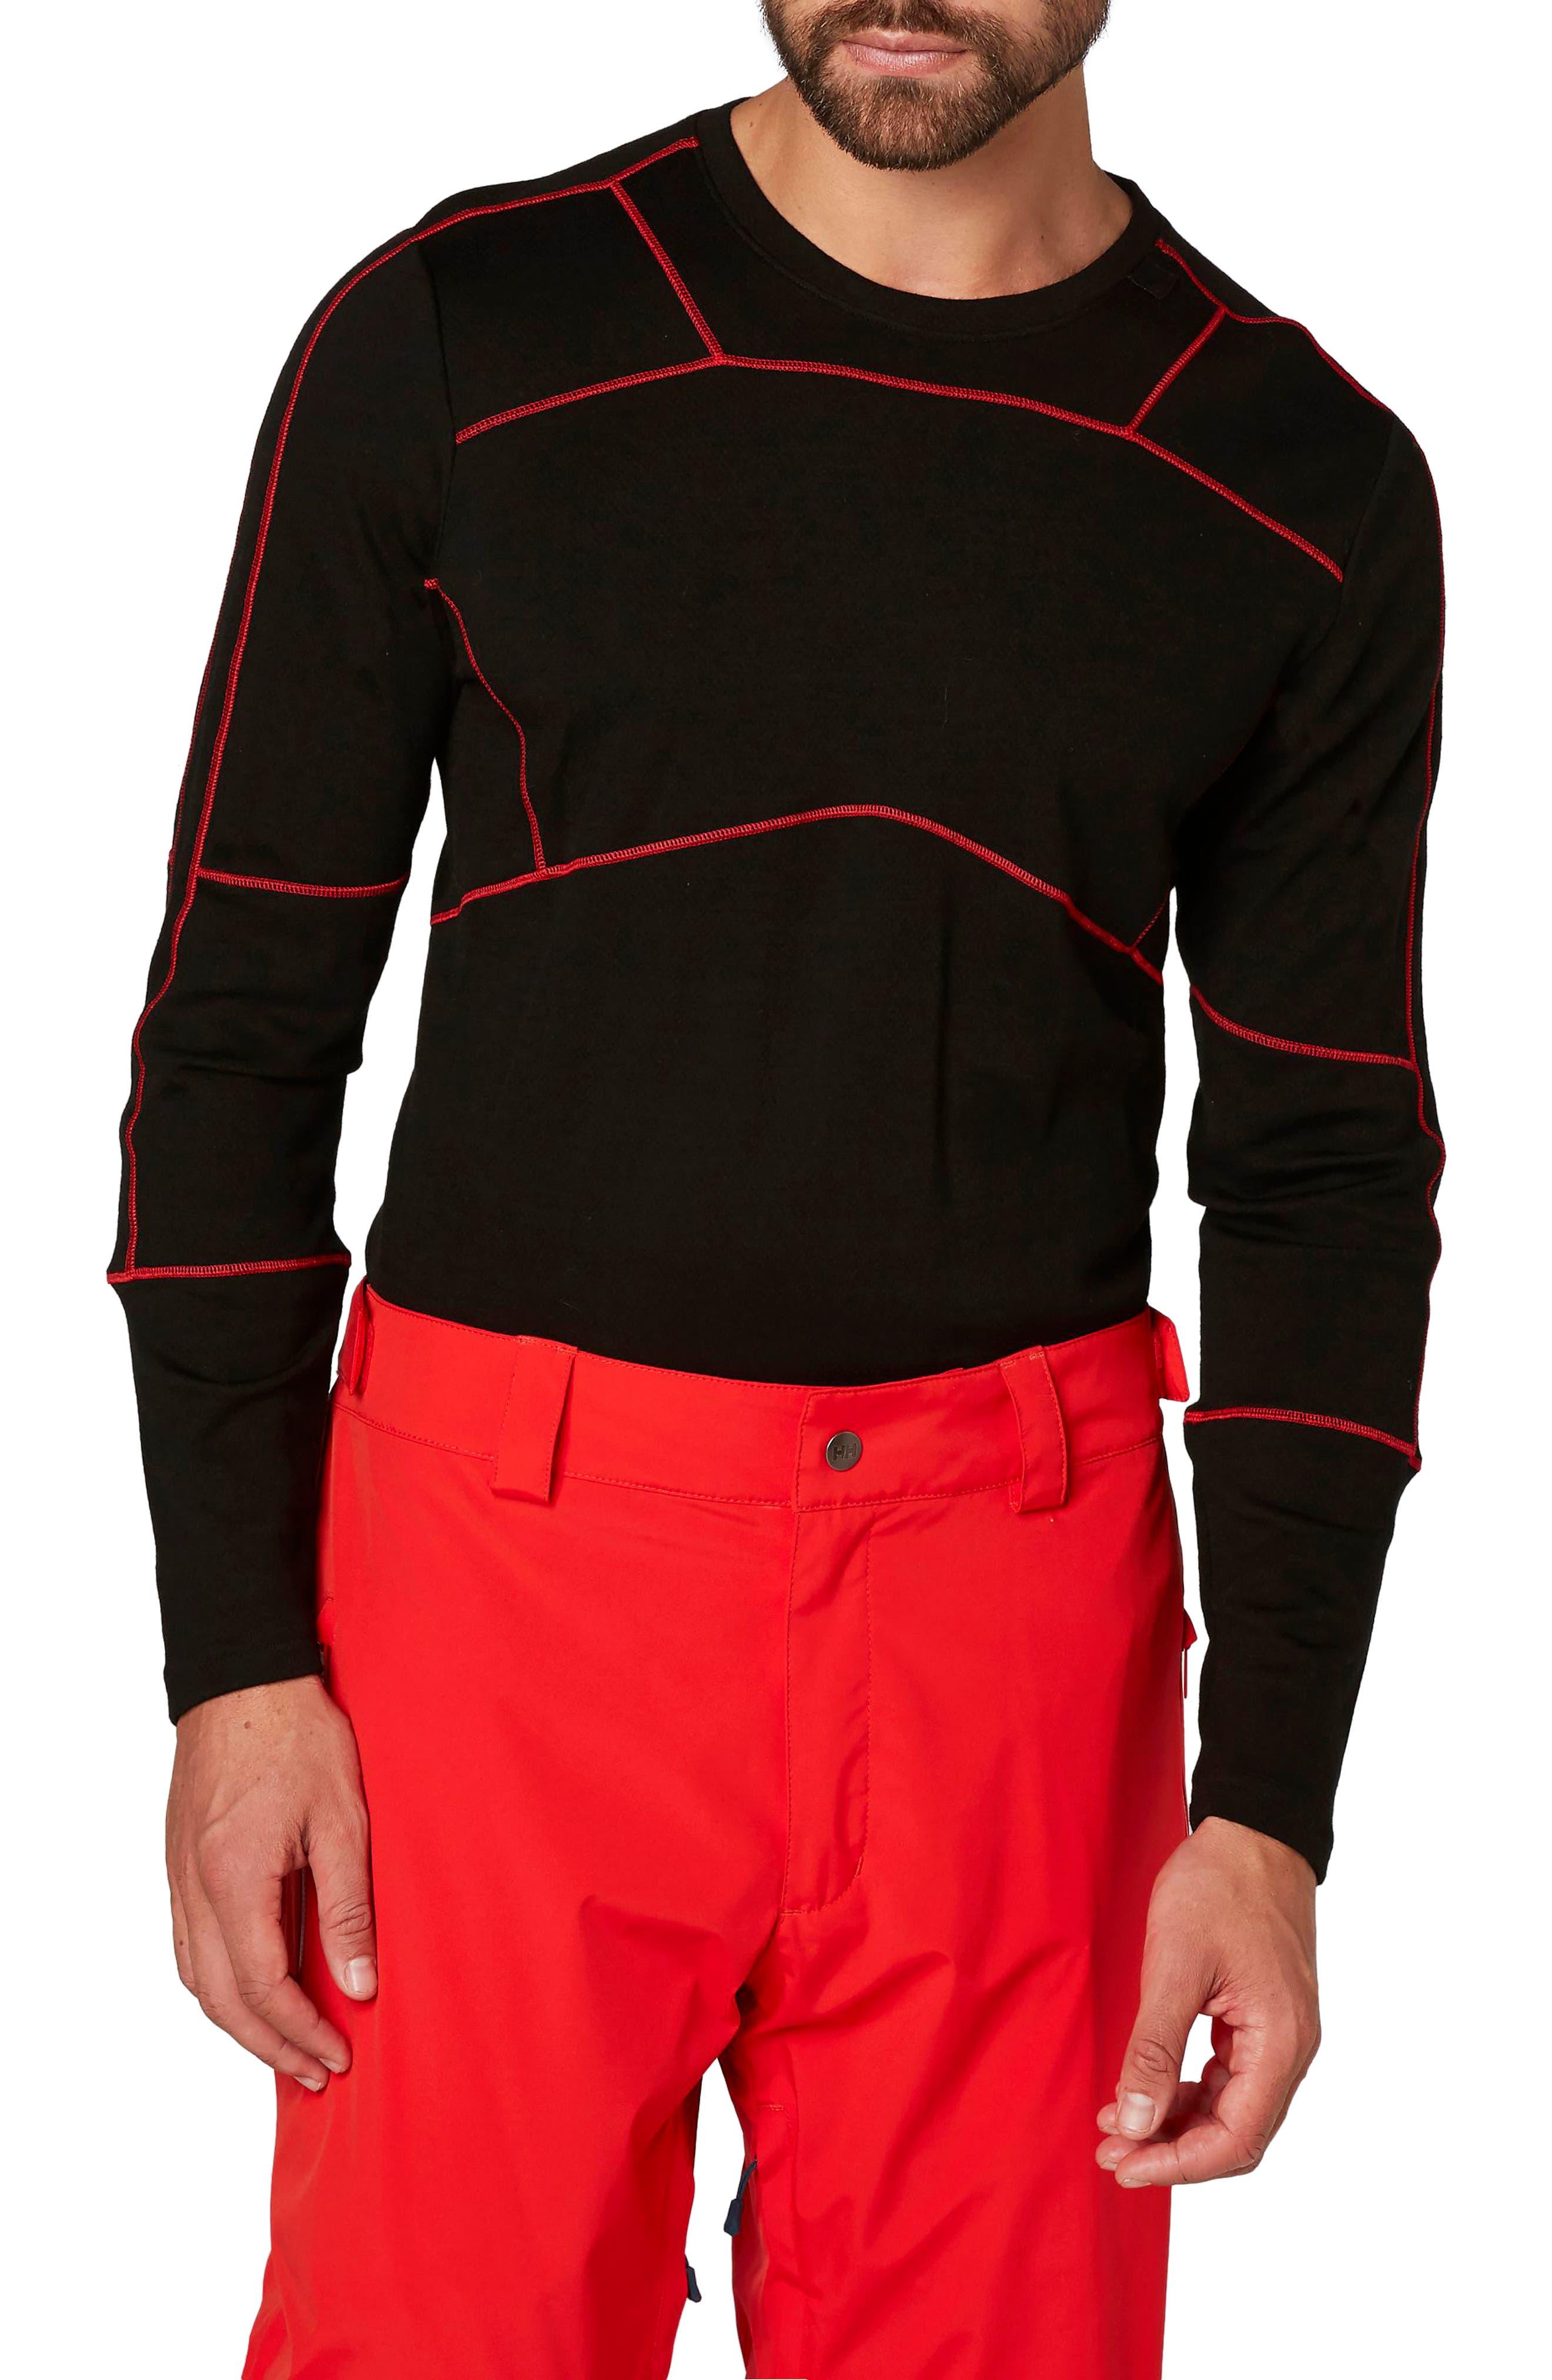 HH<sup>®</sup> Lifa Merino Max Crewneck Pullover,                         Main,                         color, Black / Flag Red